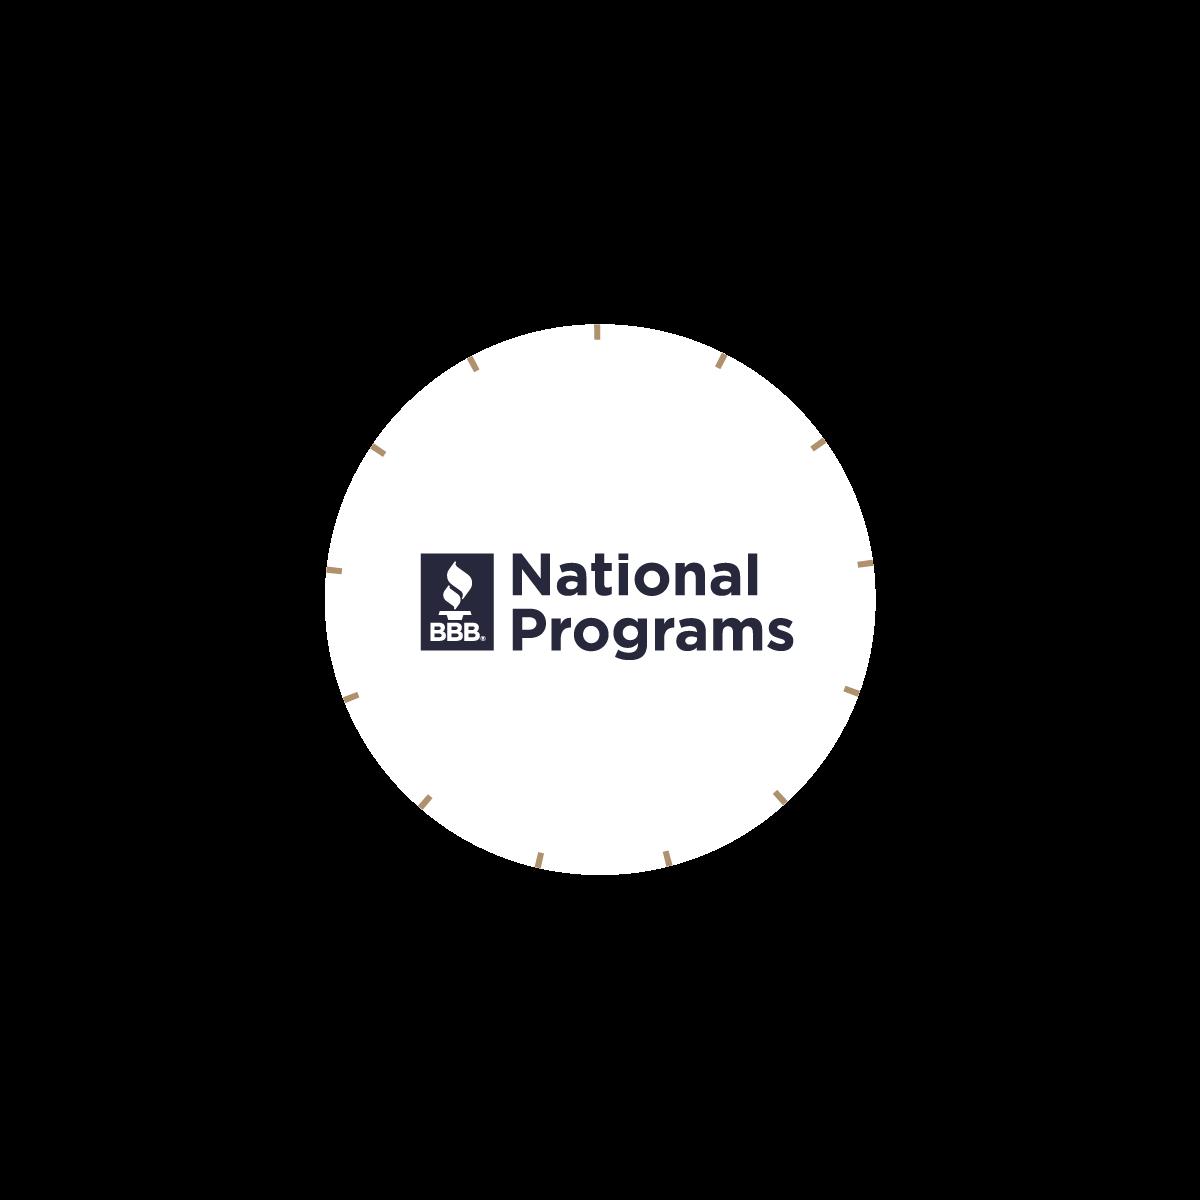 BBB National Programs